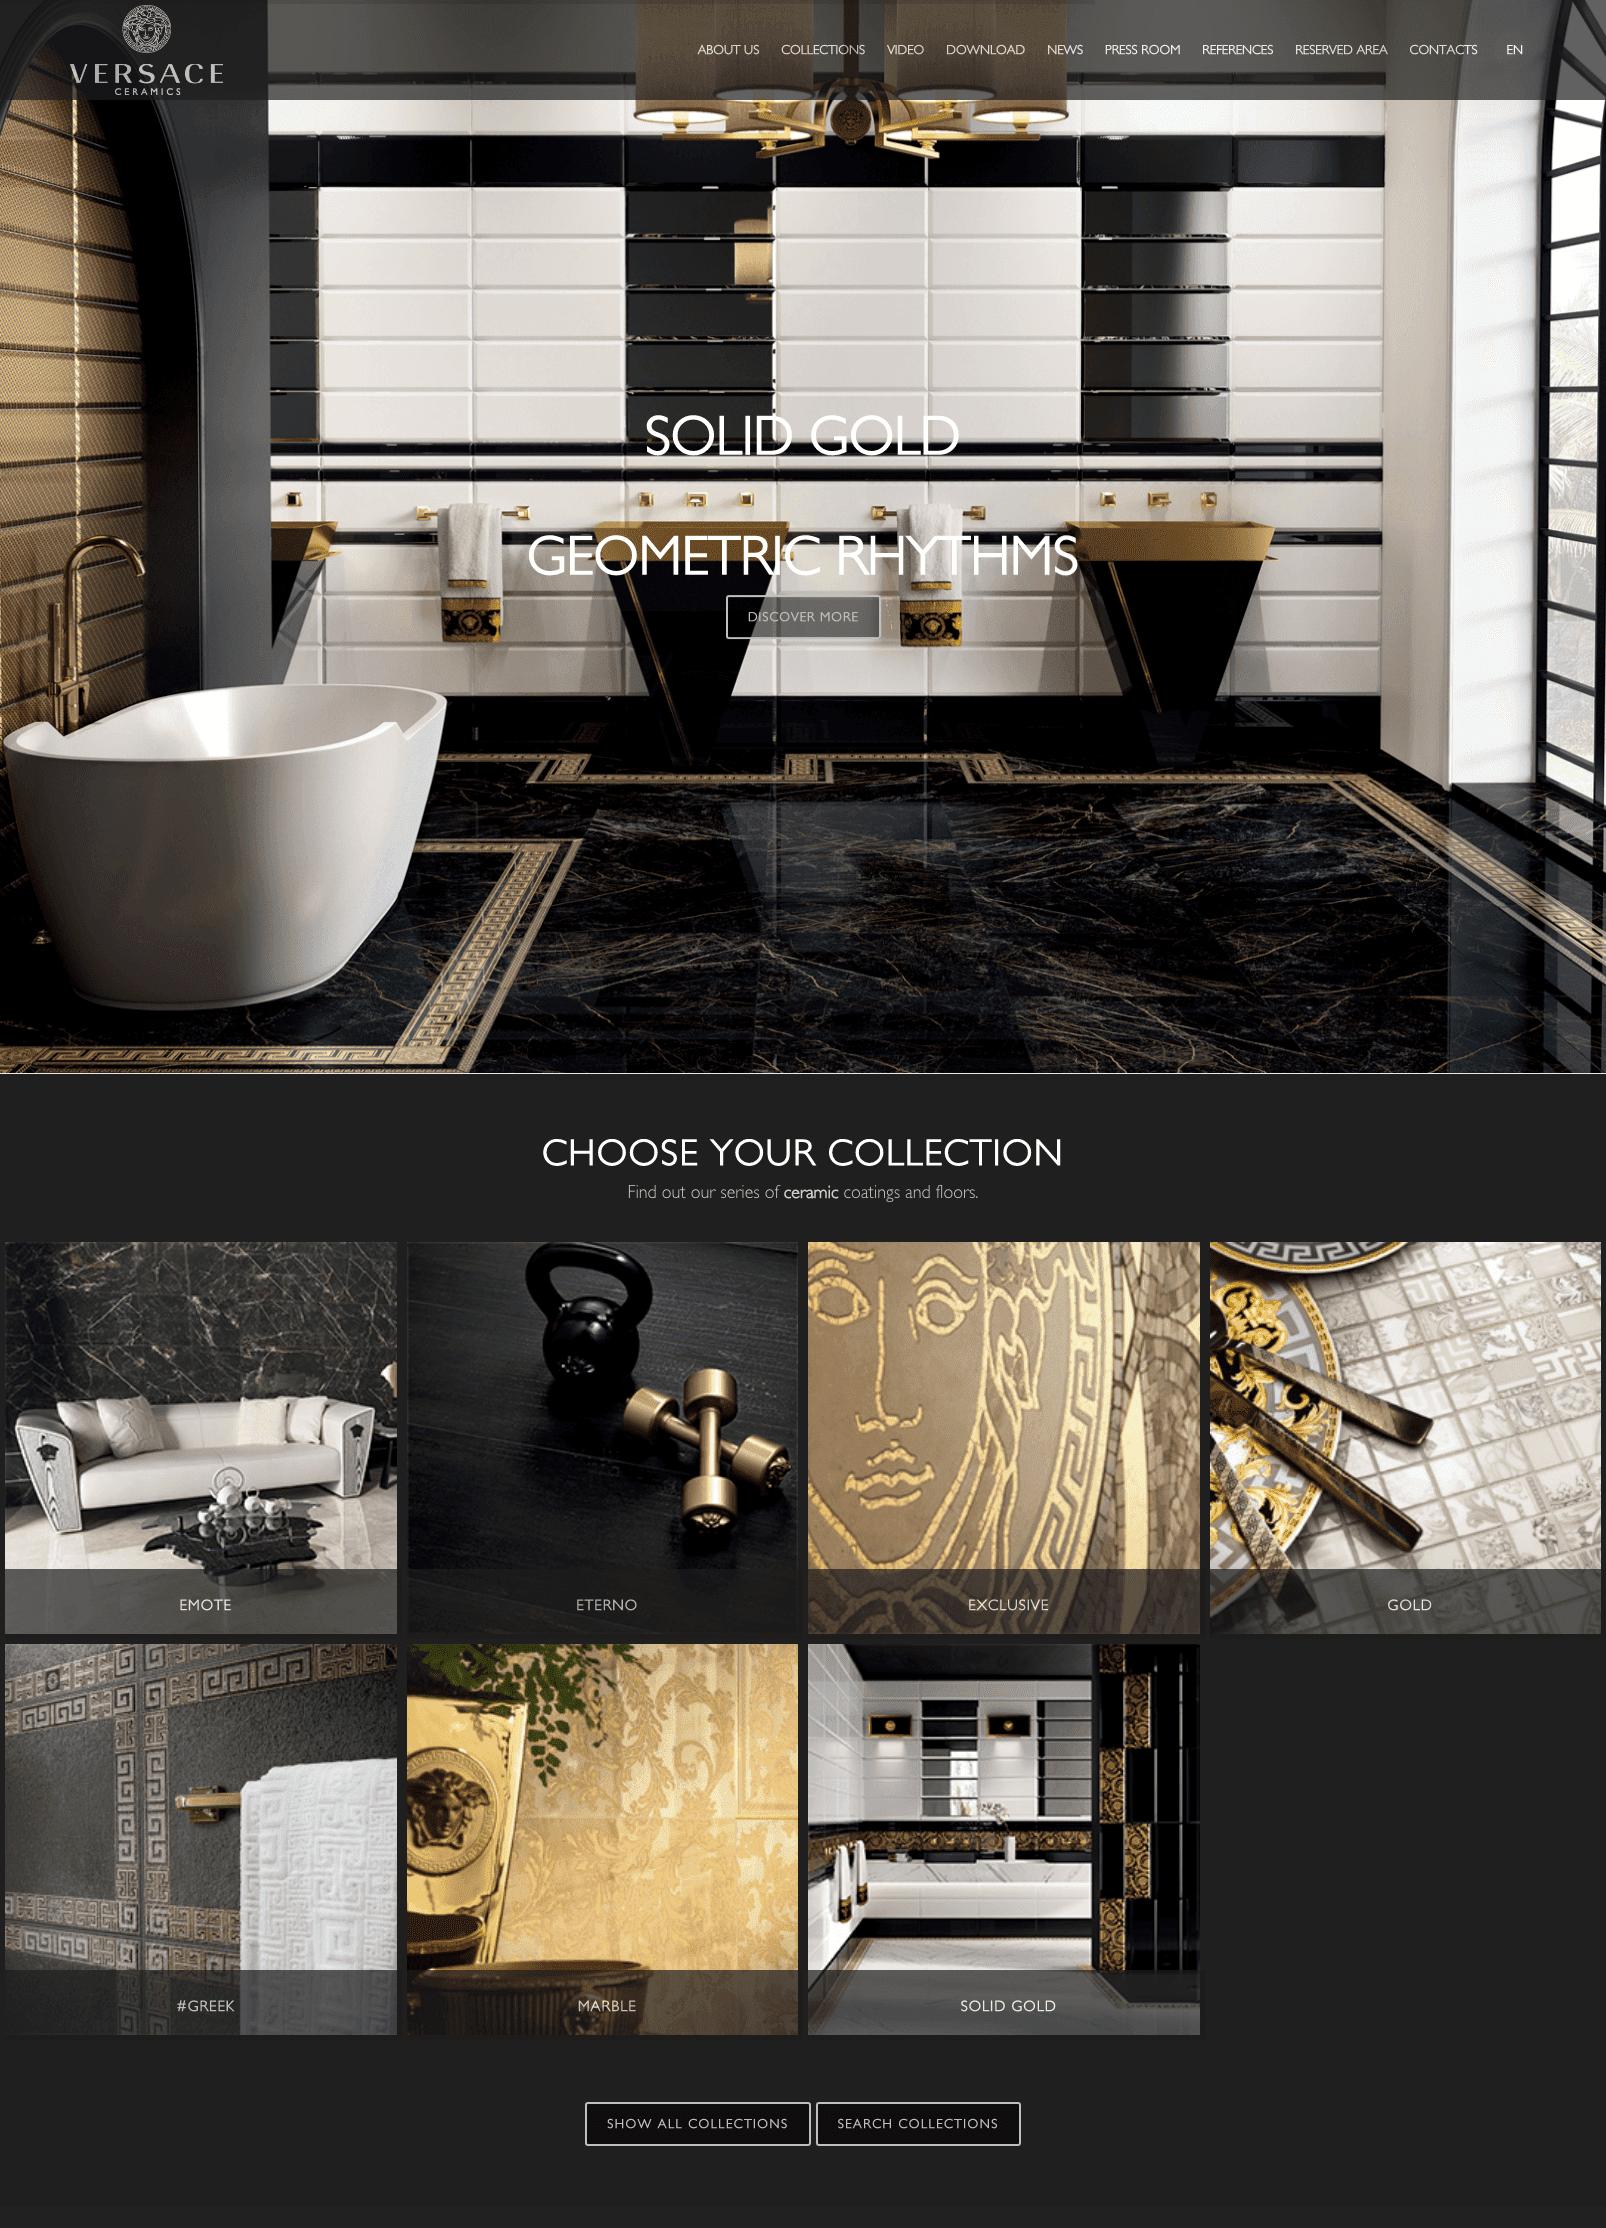 versace-tiles.com